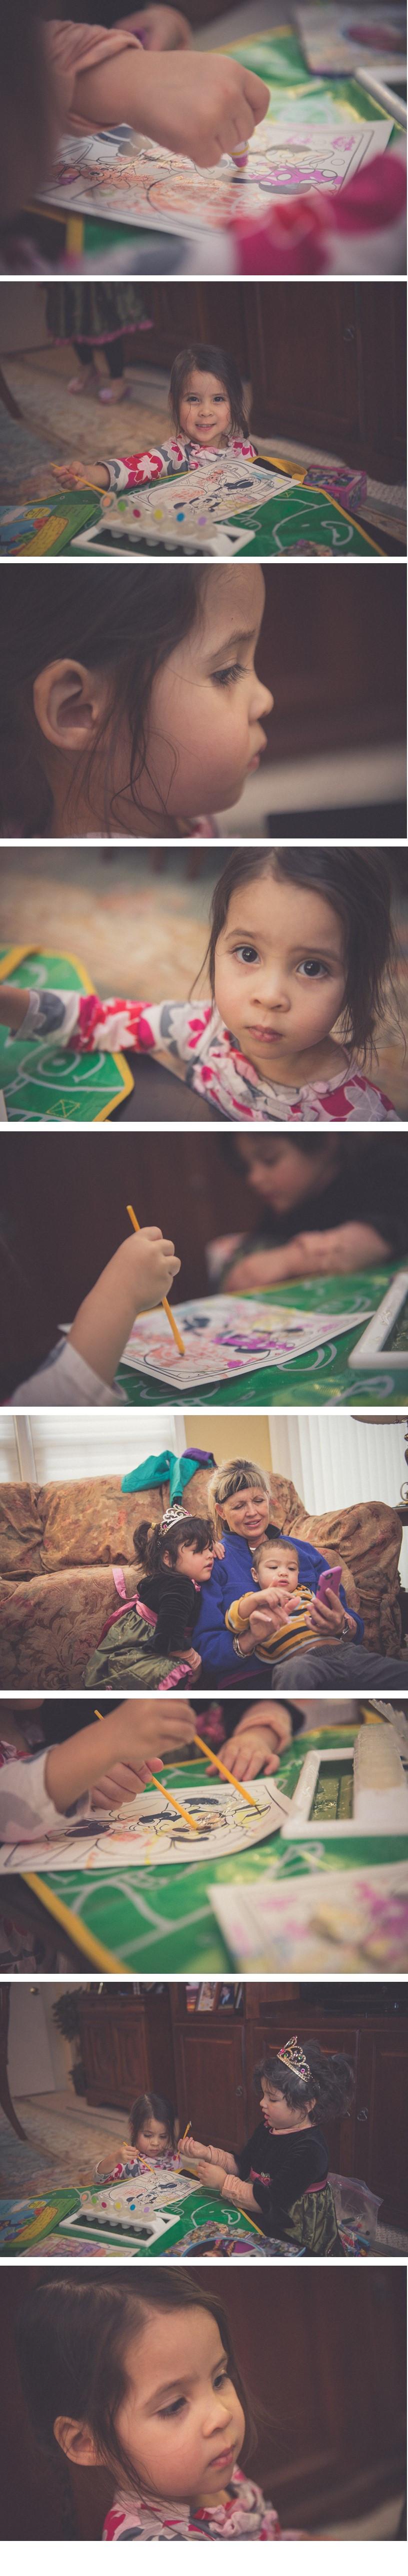 craft time.jpg